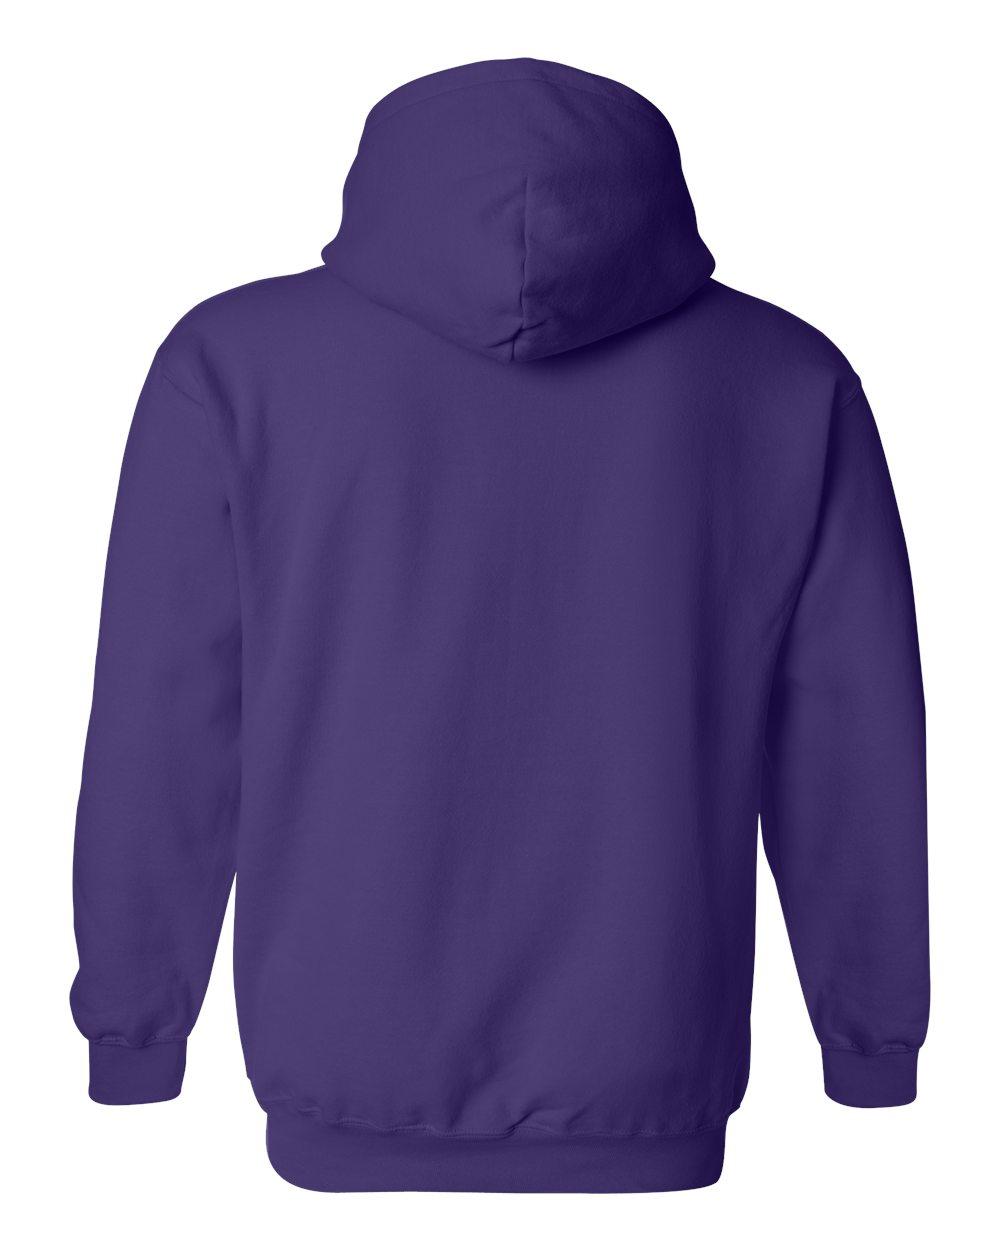 Gildan-Mens-Blank-Hoodie-Heavy-Blend-Hooded-Sweatshirt-Solid-18500-up-to-5XL thumbnail 72